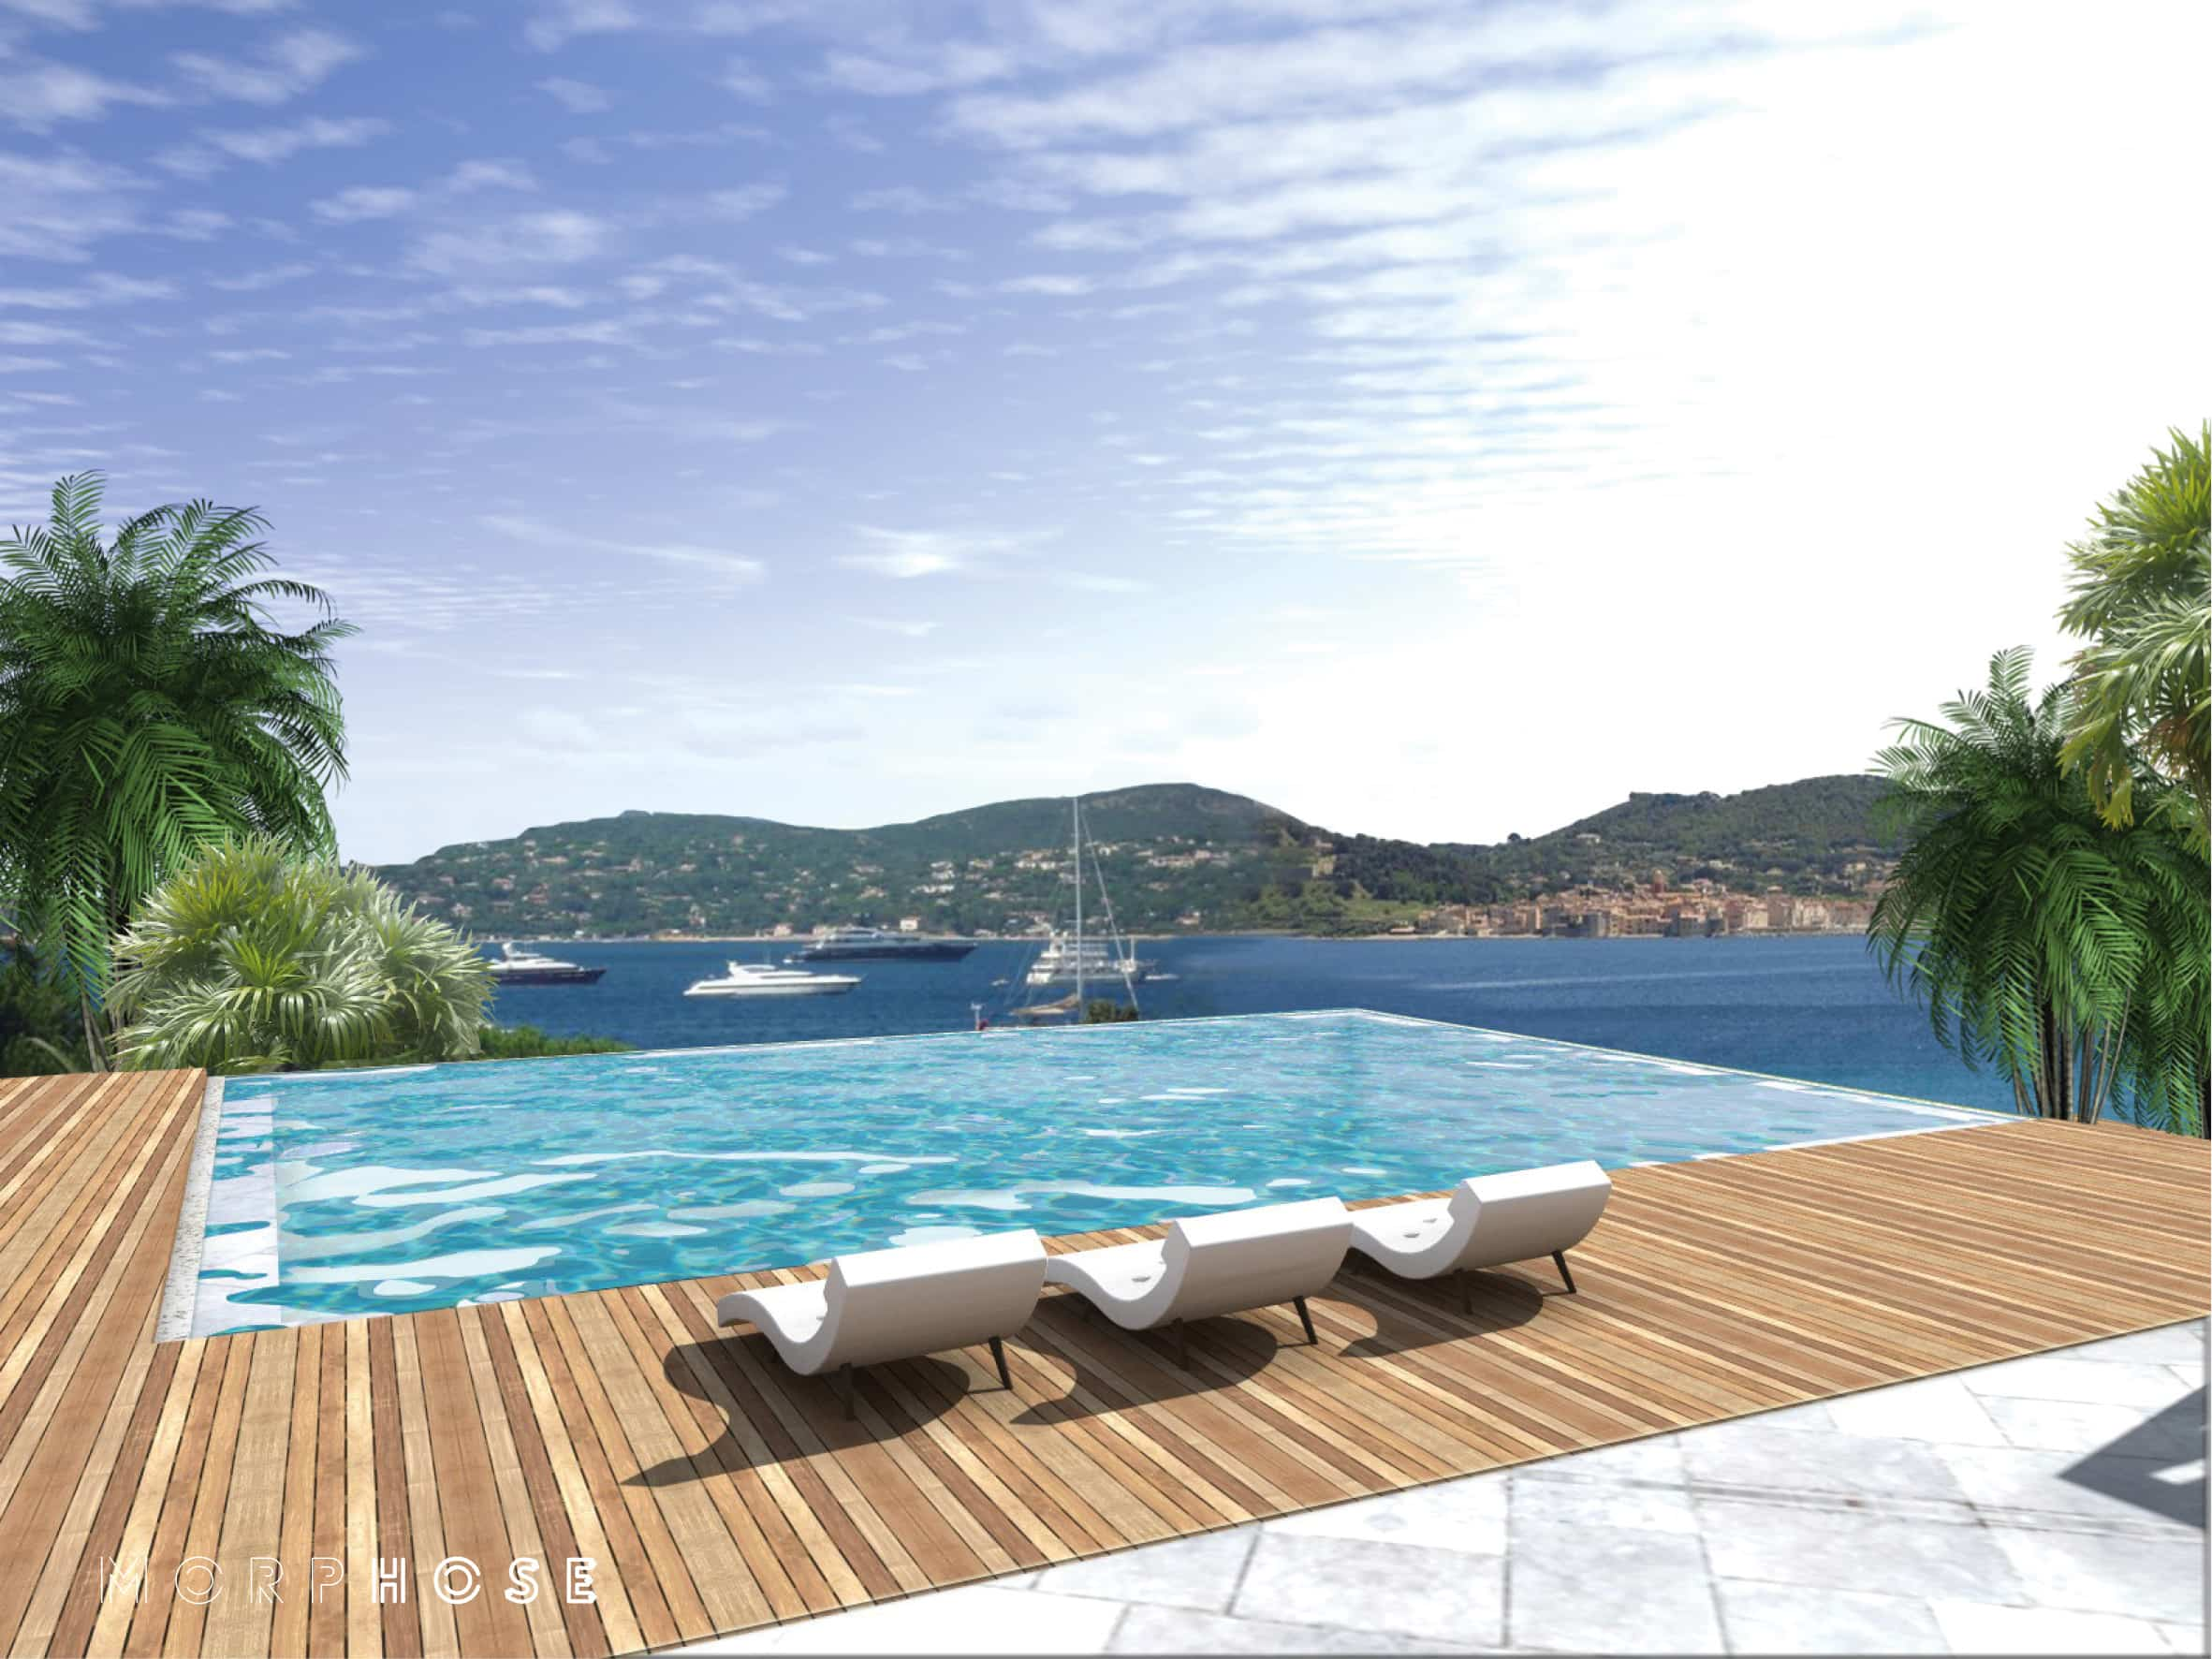 Conception villa haut de gamme Guerrevieille2